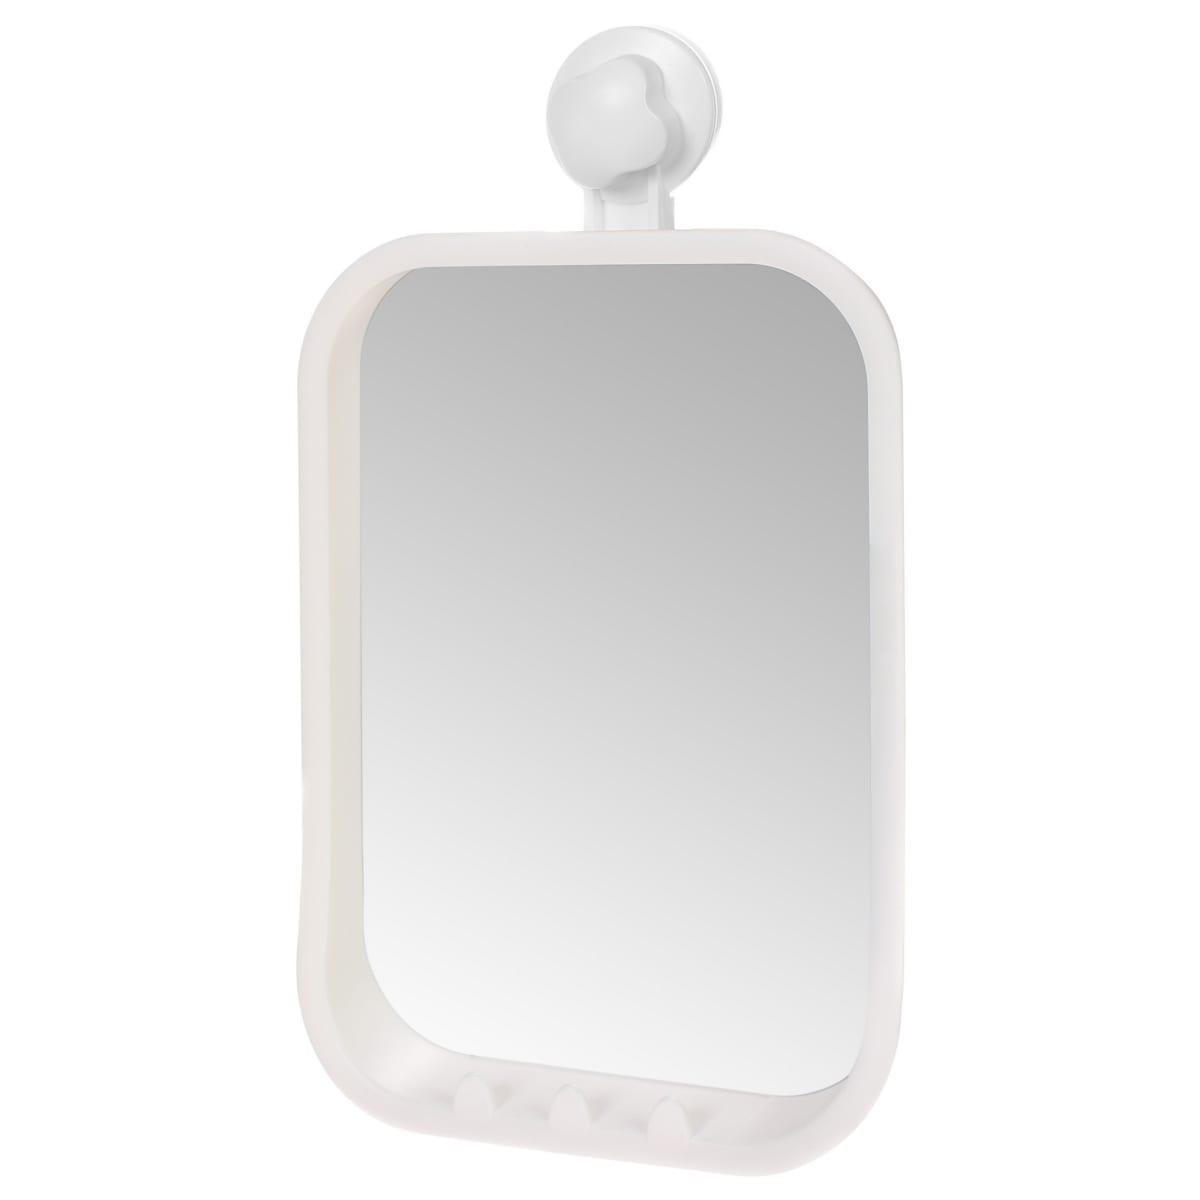 Зеркало косметическое Grampus на вакуумной присоске 21х36 см материал пластик